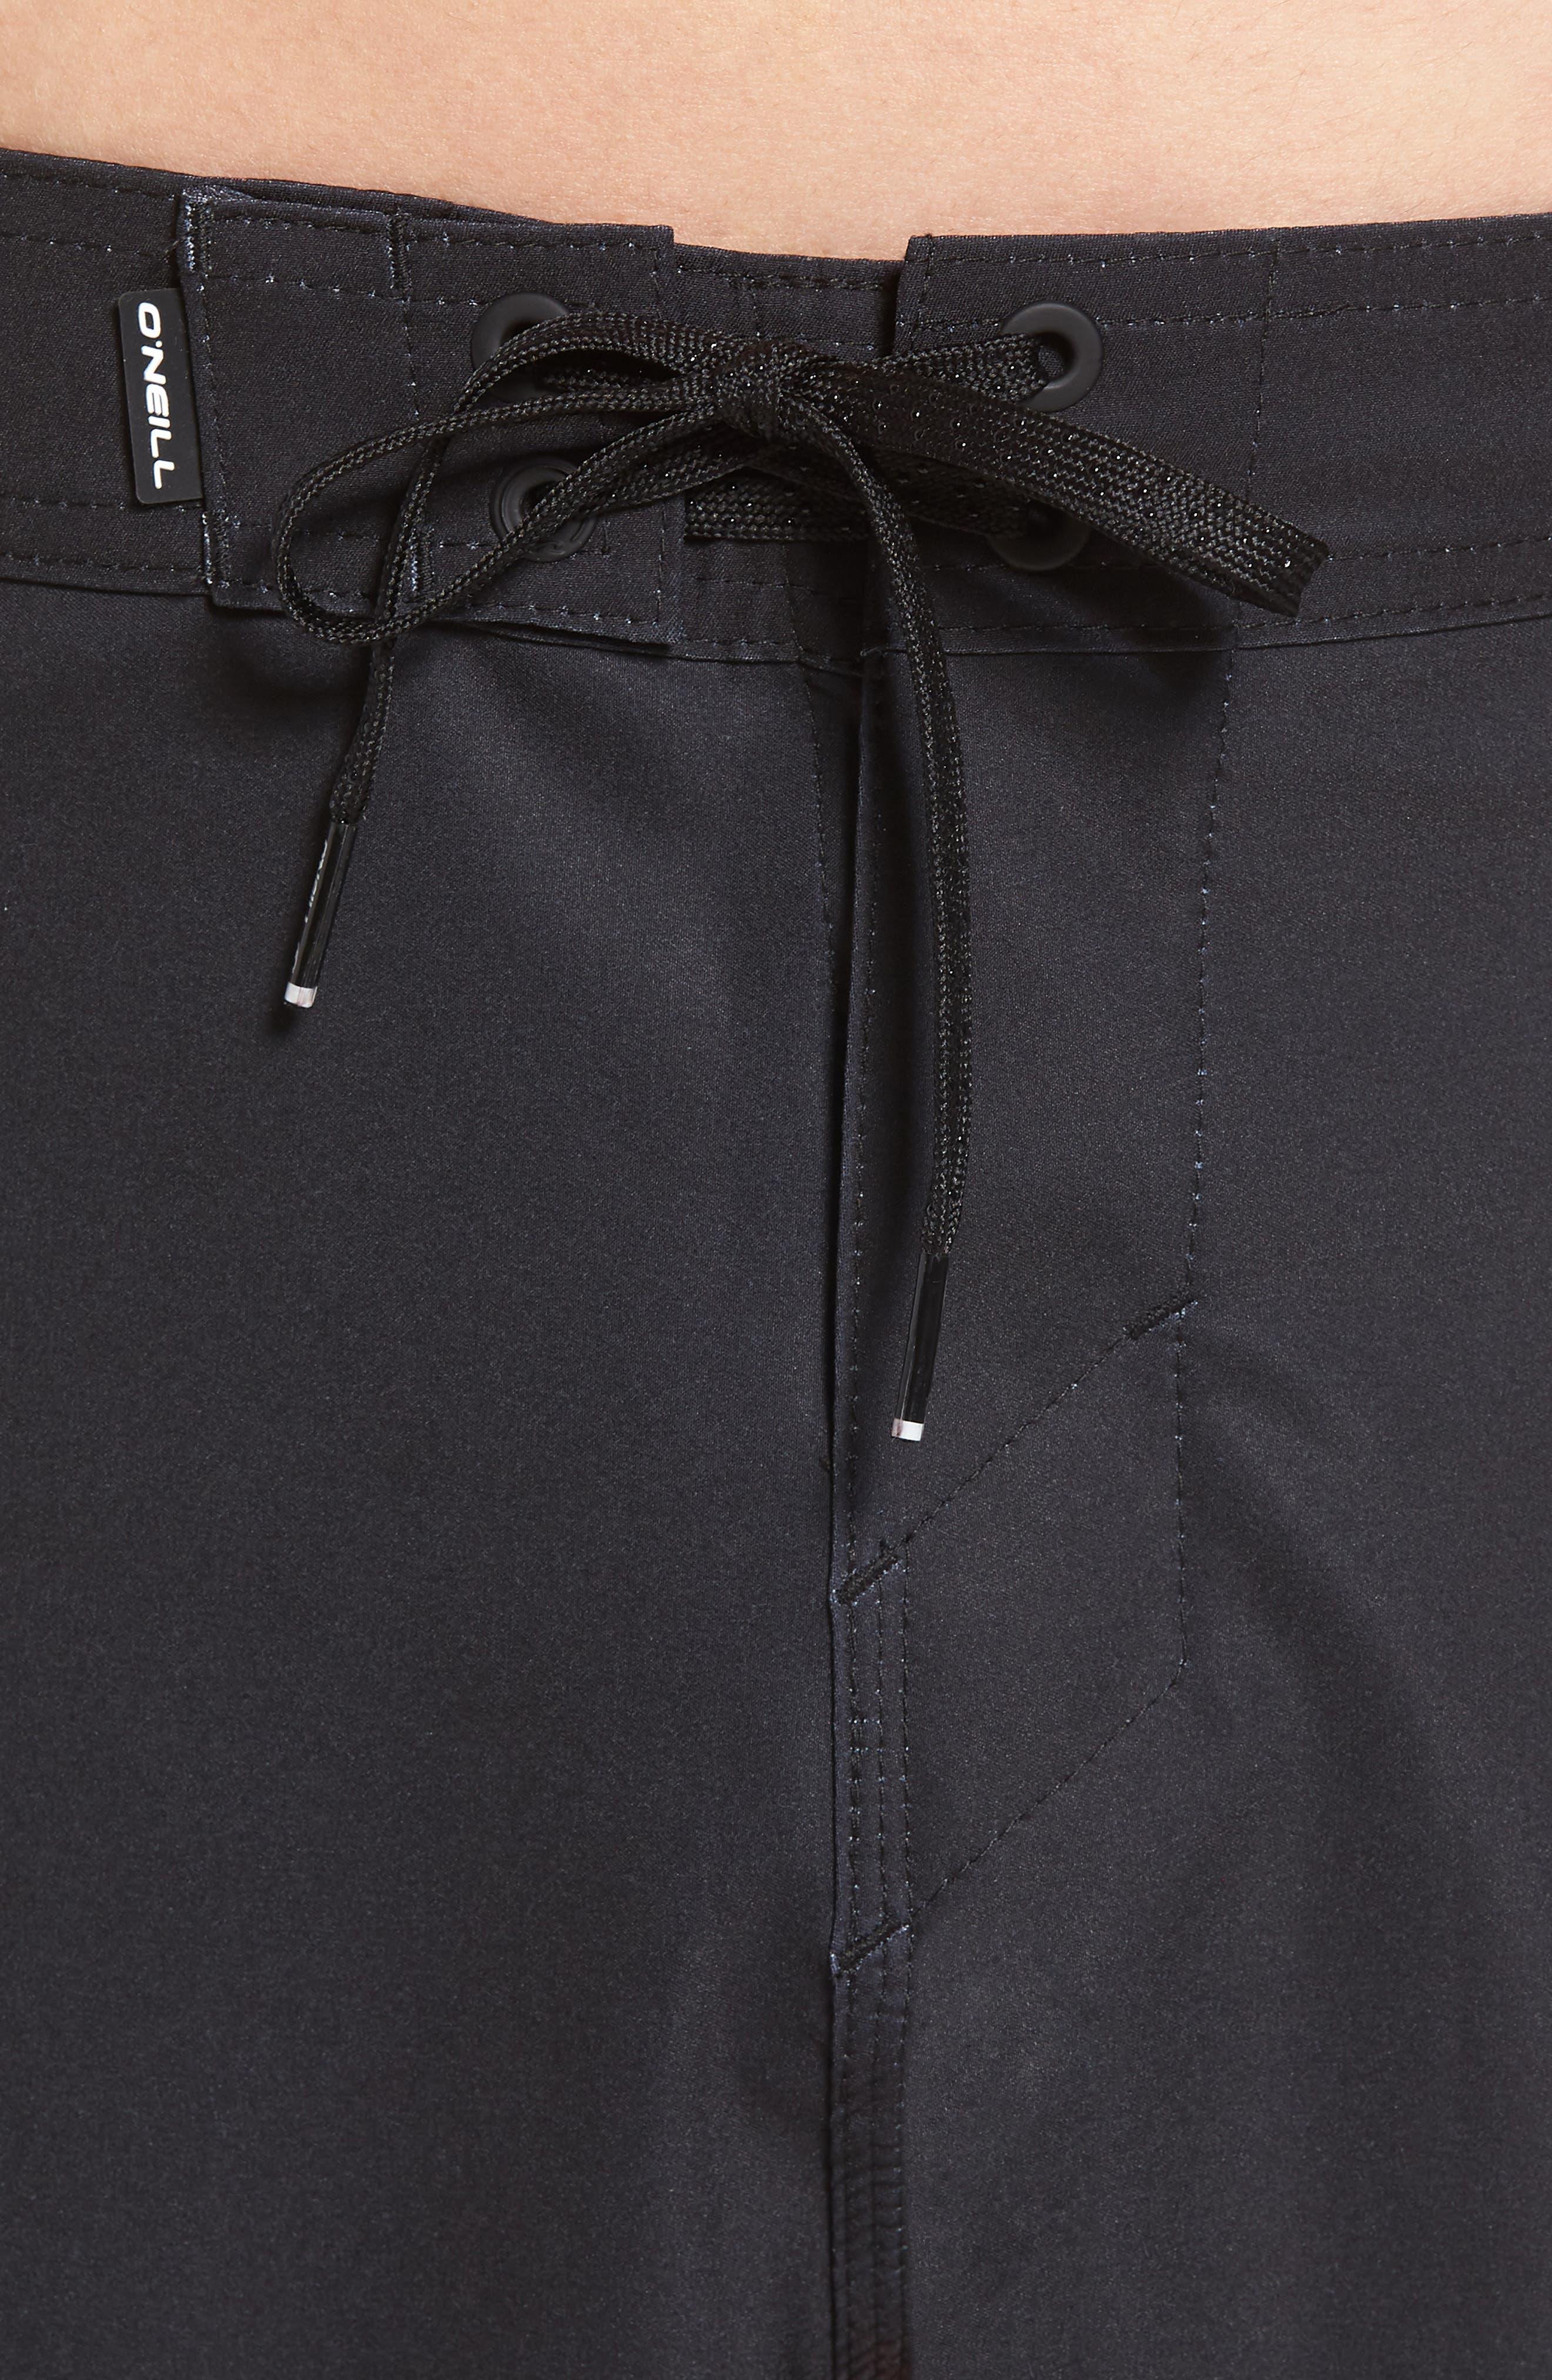 Hyperfreak Drippin' Board Shorts,                             Alternate thumbnail 5, color,                             Black